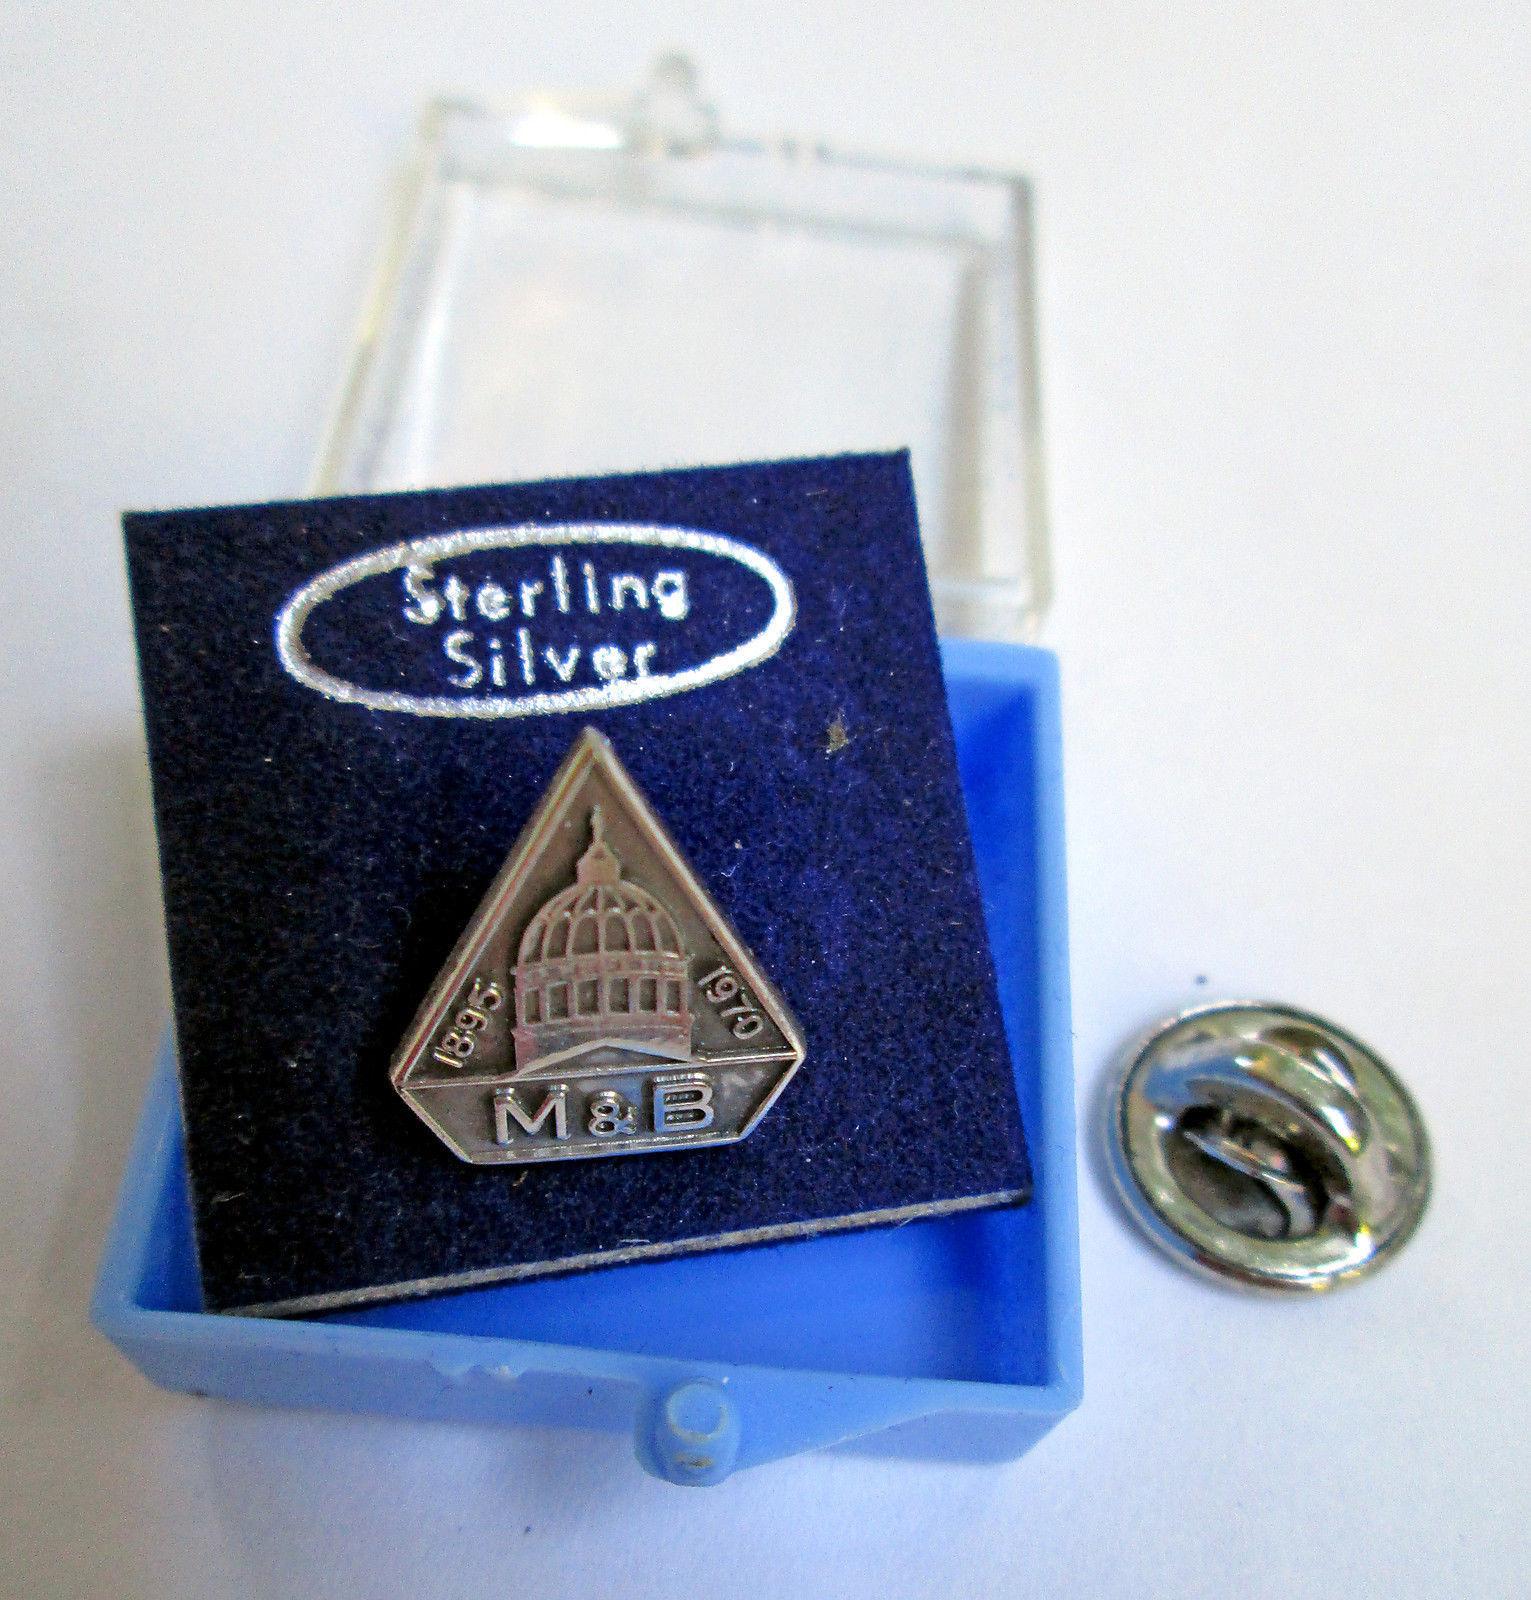 Sterling Silver M&B Pin Merchants & Business Men's Mutual Insurance Co. Liberty